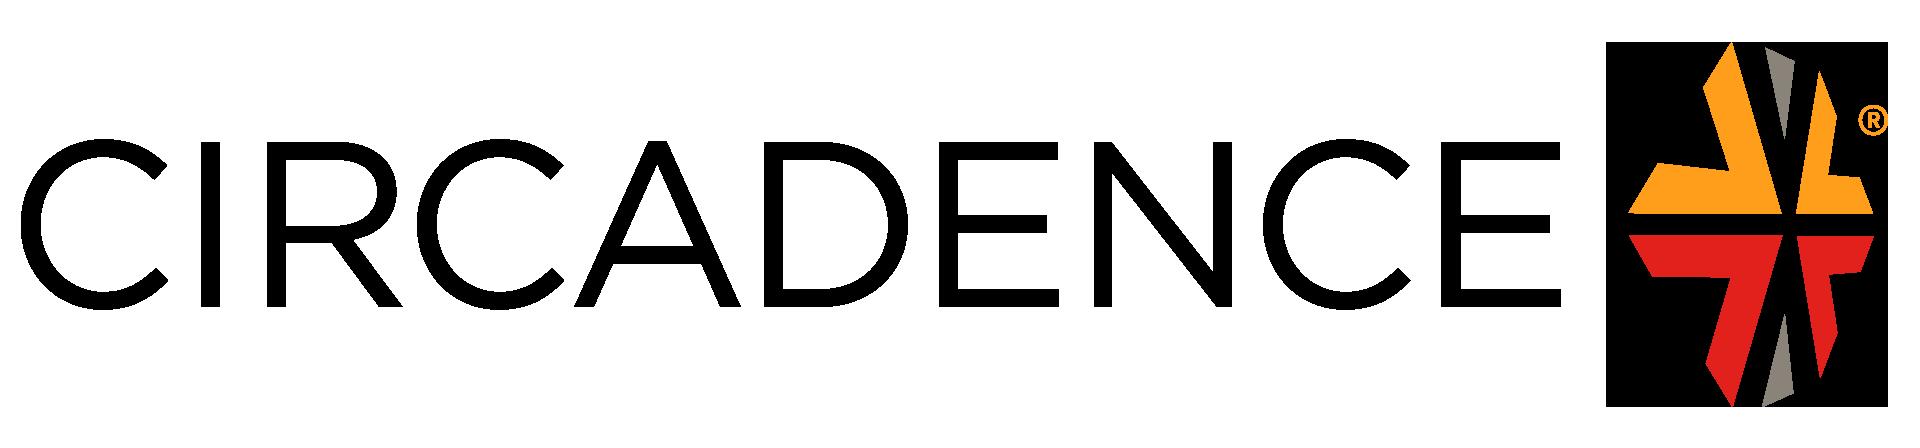 Circadence Corporation logo ---